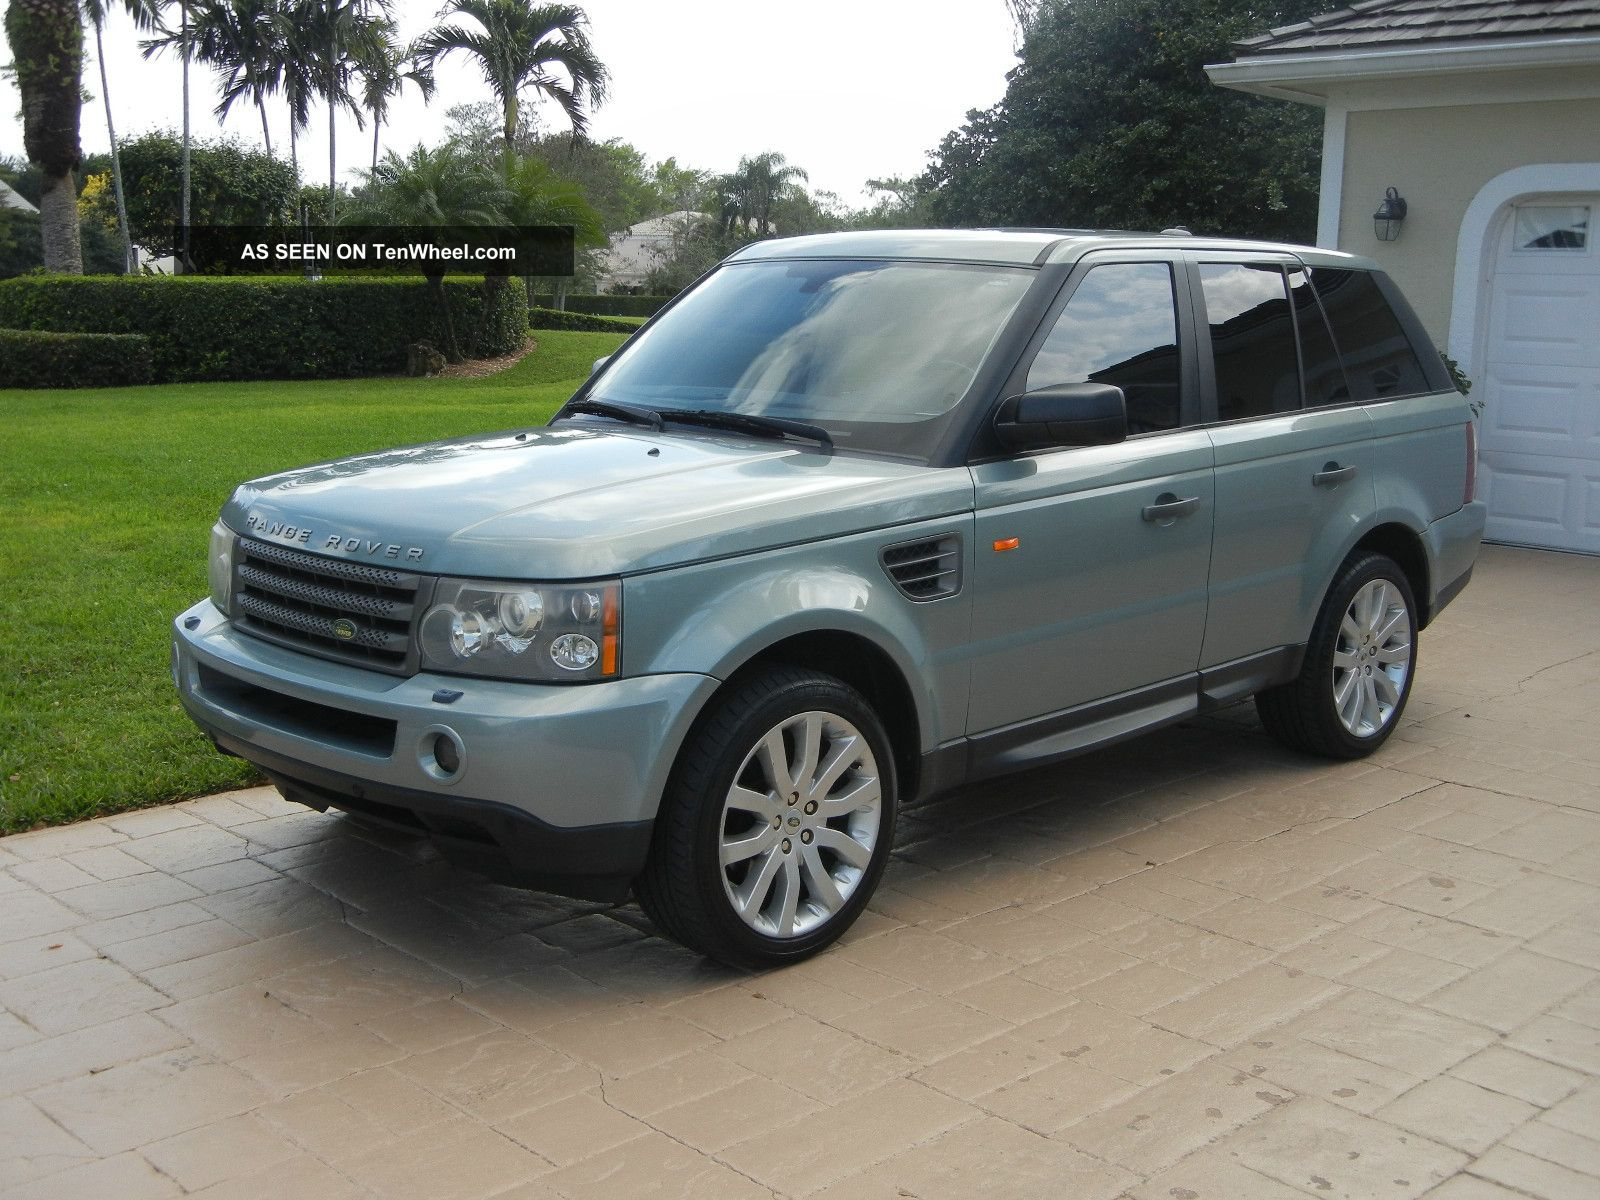 2008 range rover hse sport 4 door luxury sport utility. Black Bedroom Furniture Sets. Home Design Ideas